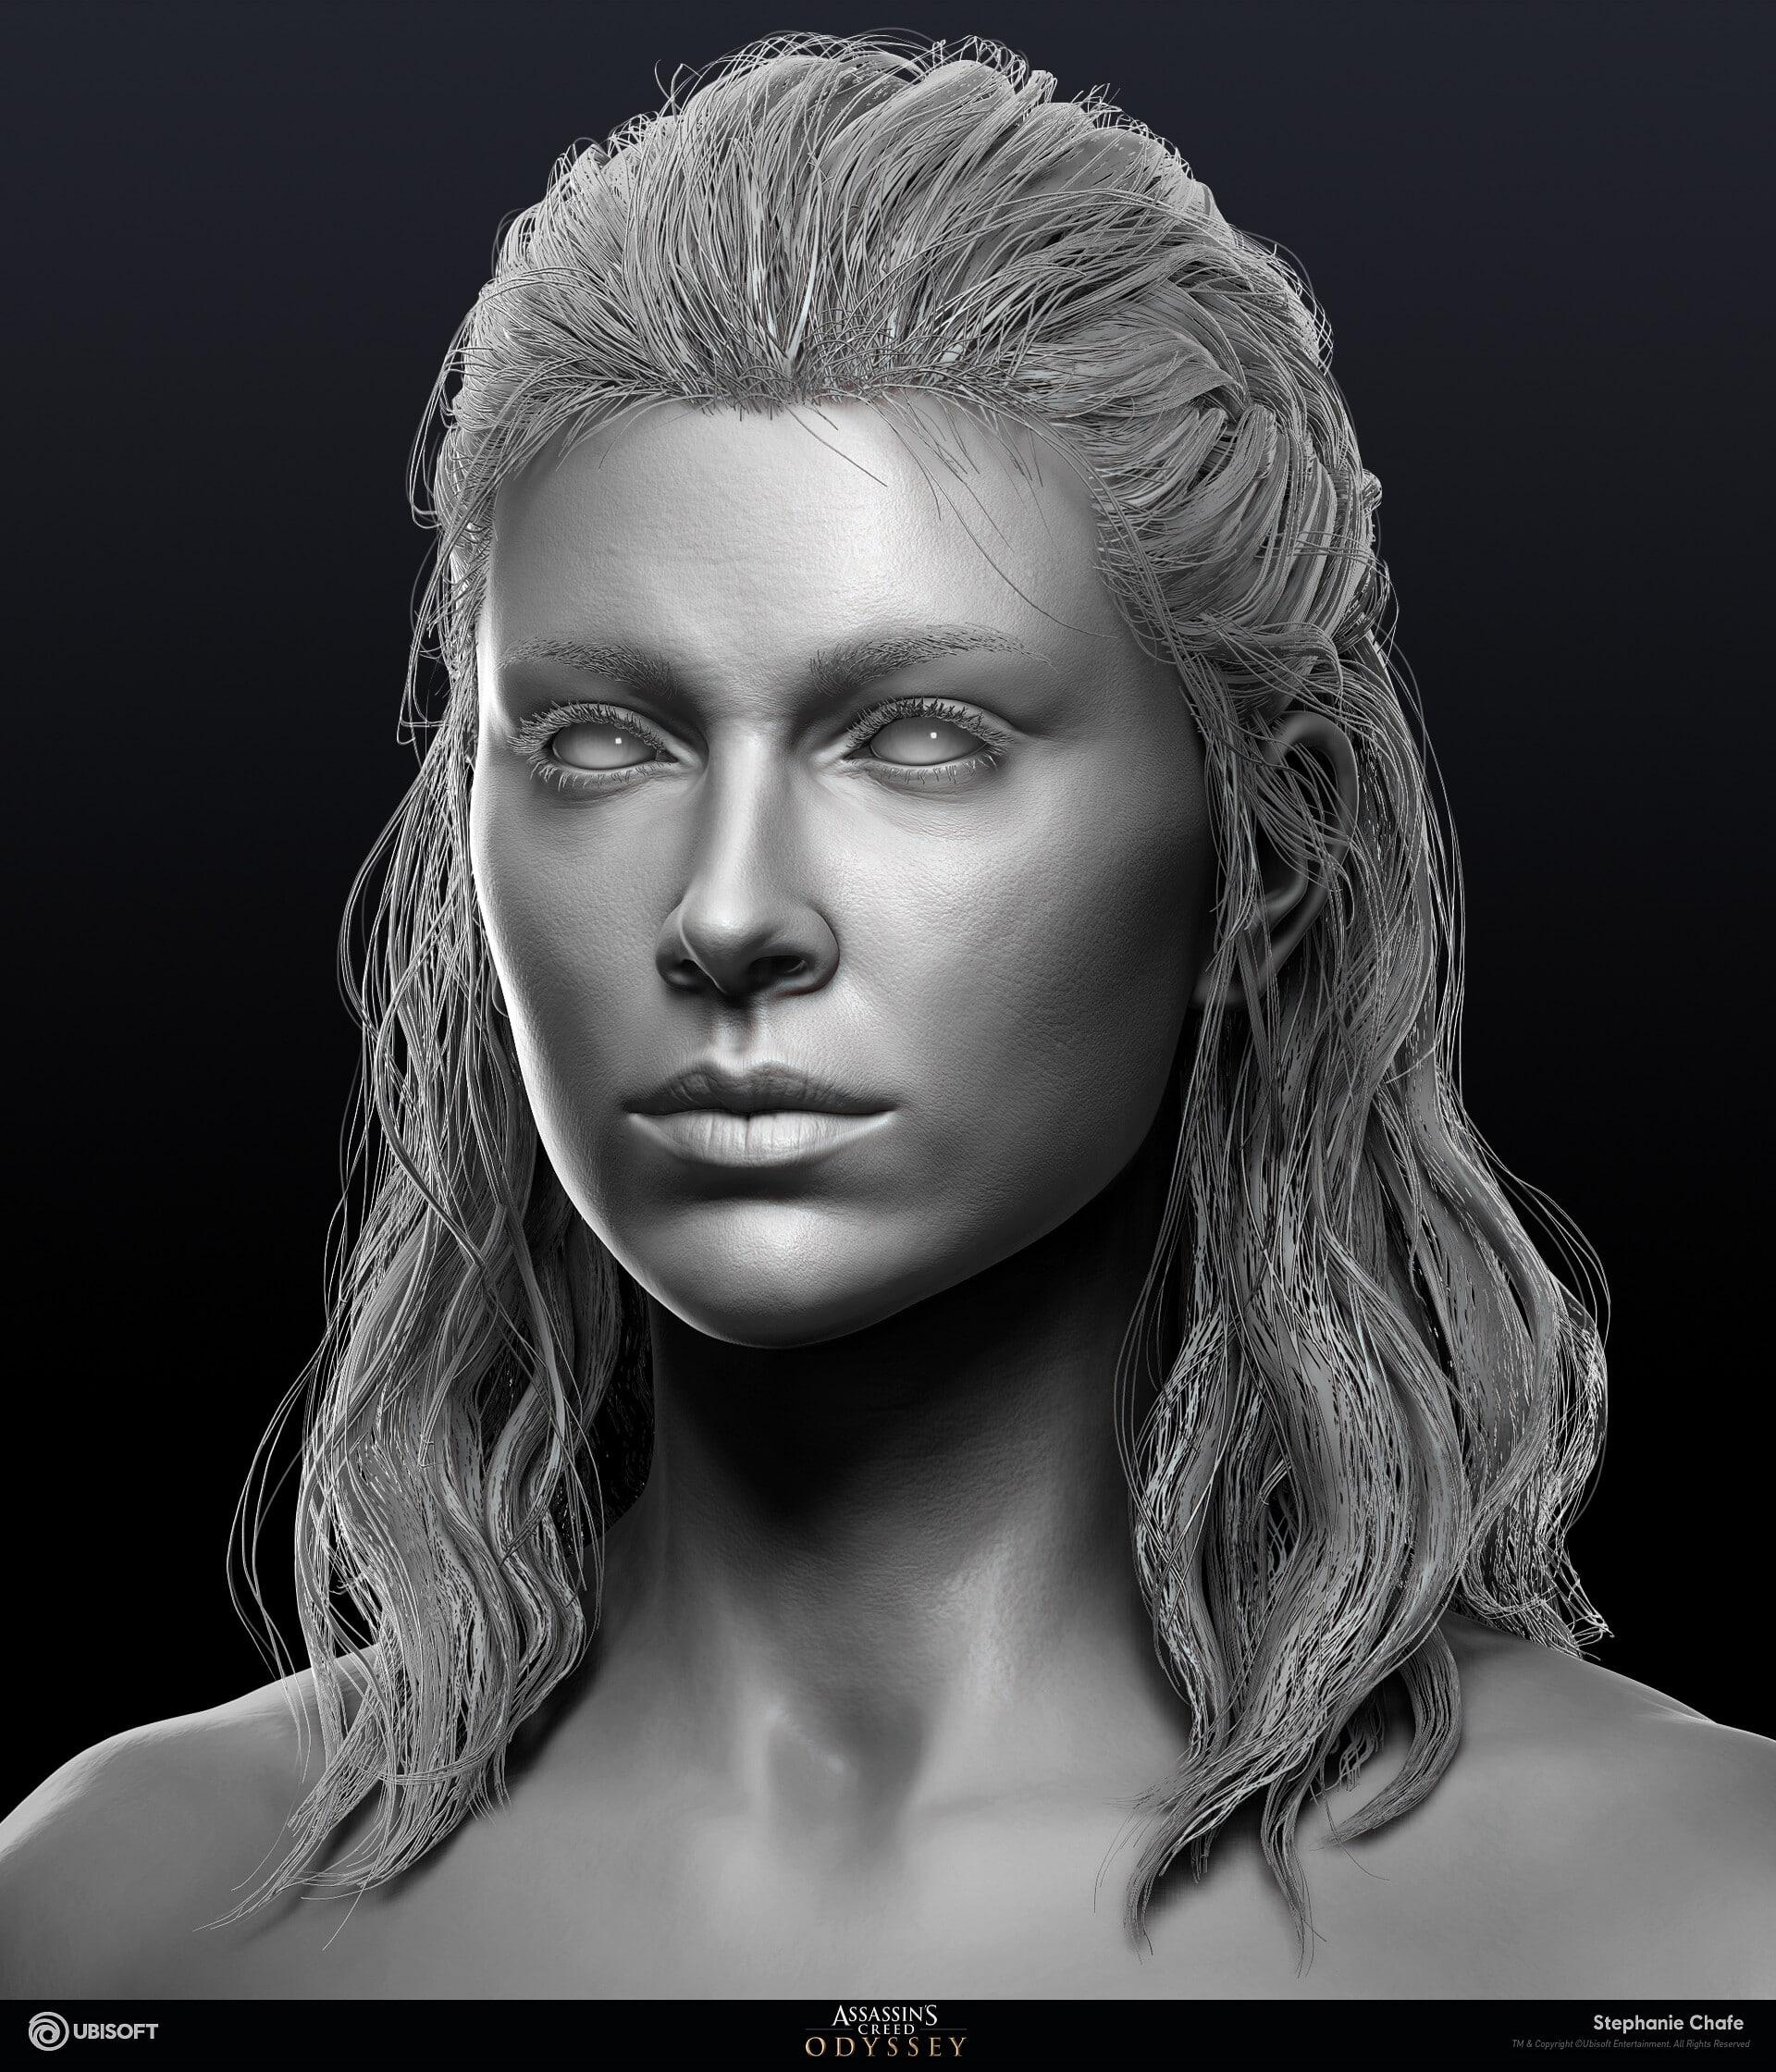 stephanie-chafe-artblast-persephonesculpt2